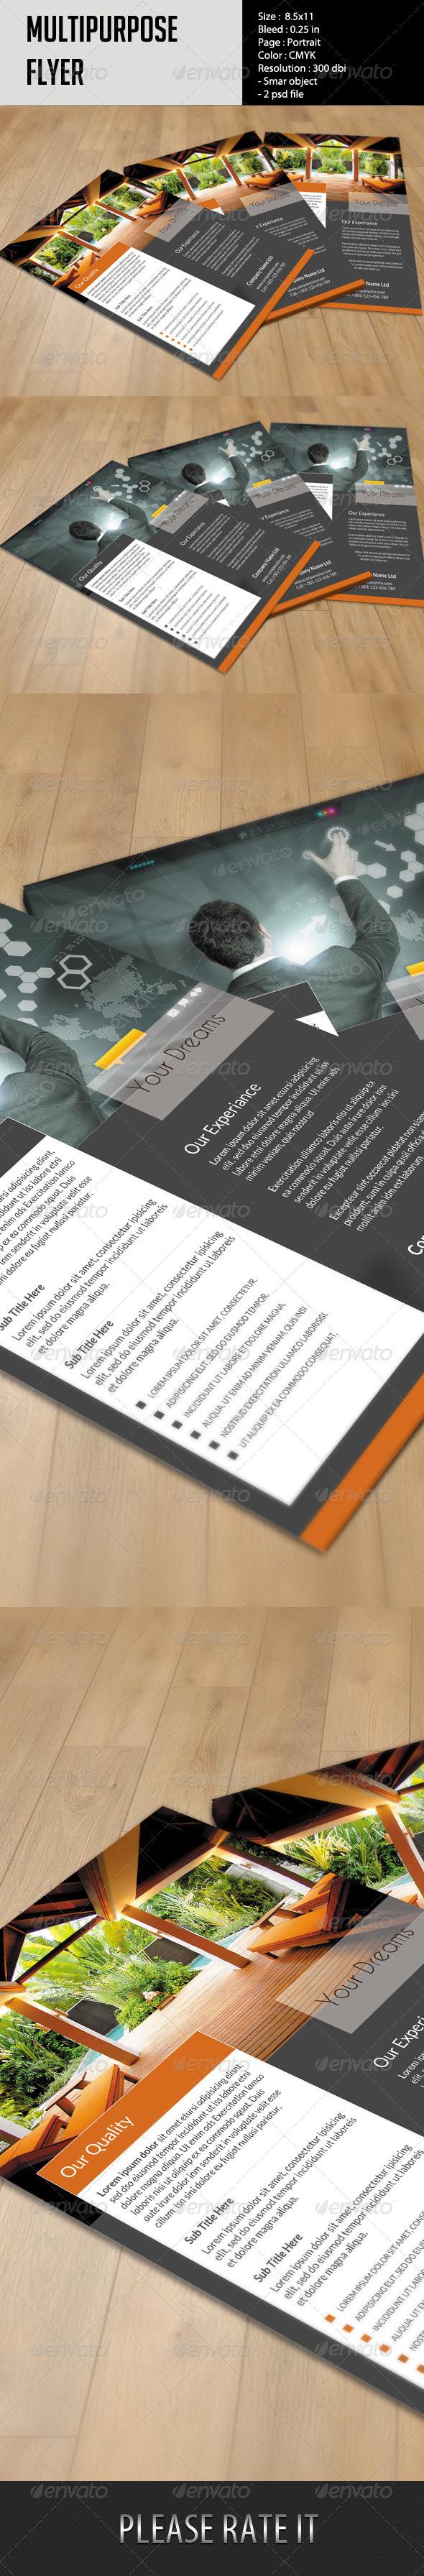 GraphicRiver Multipurpose Flyer Template 6056147